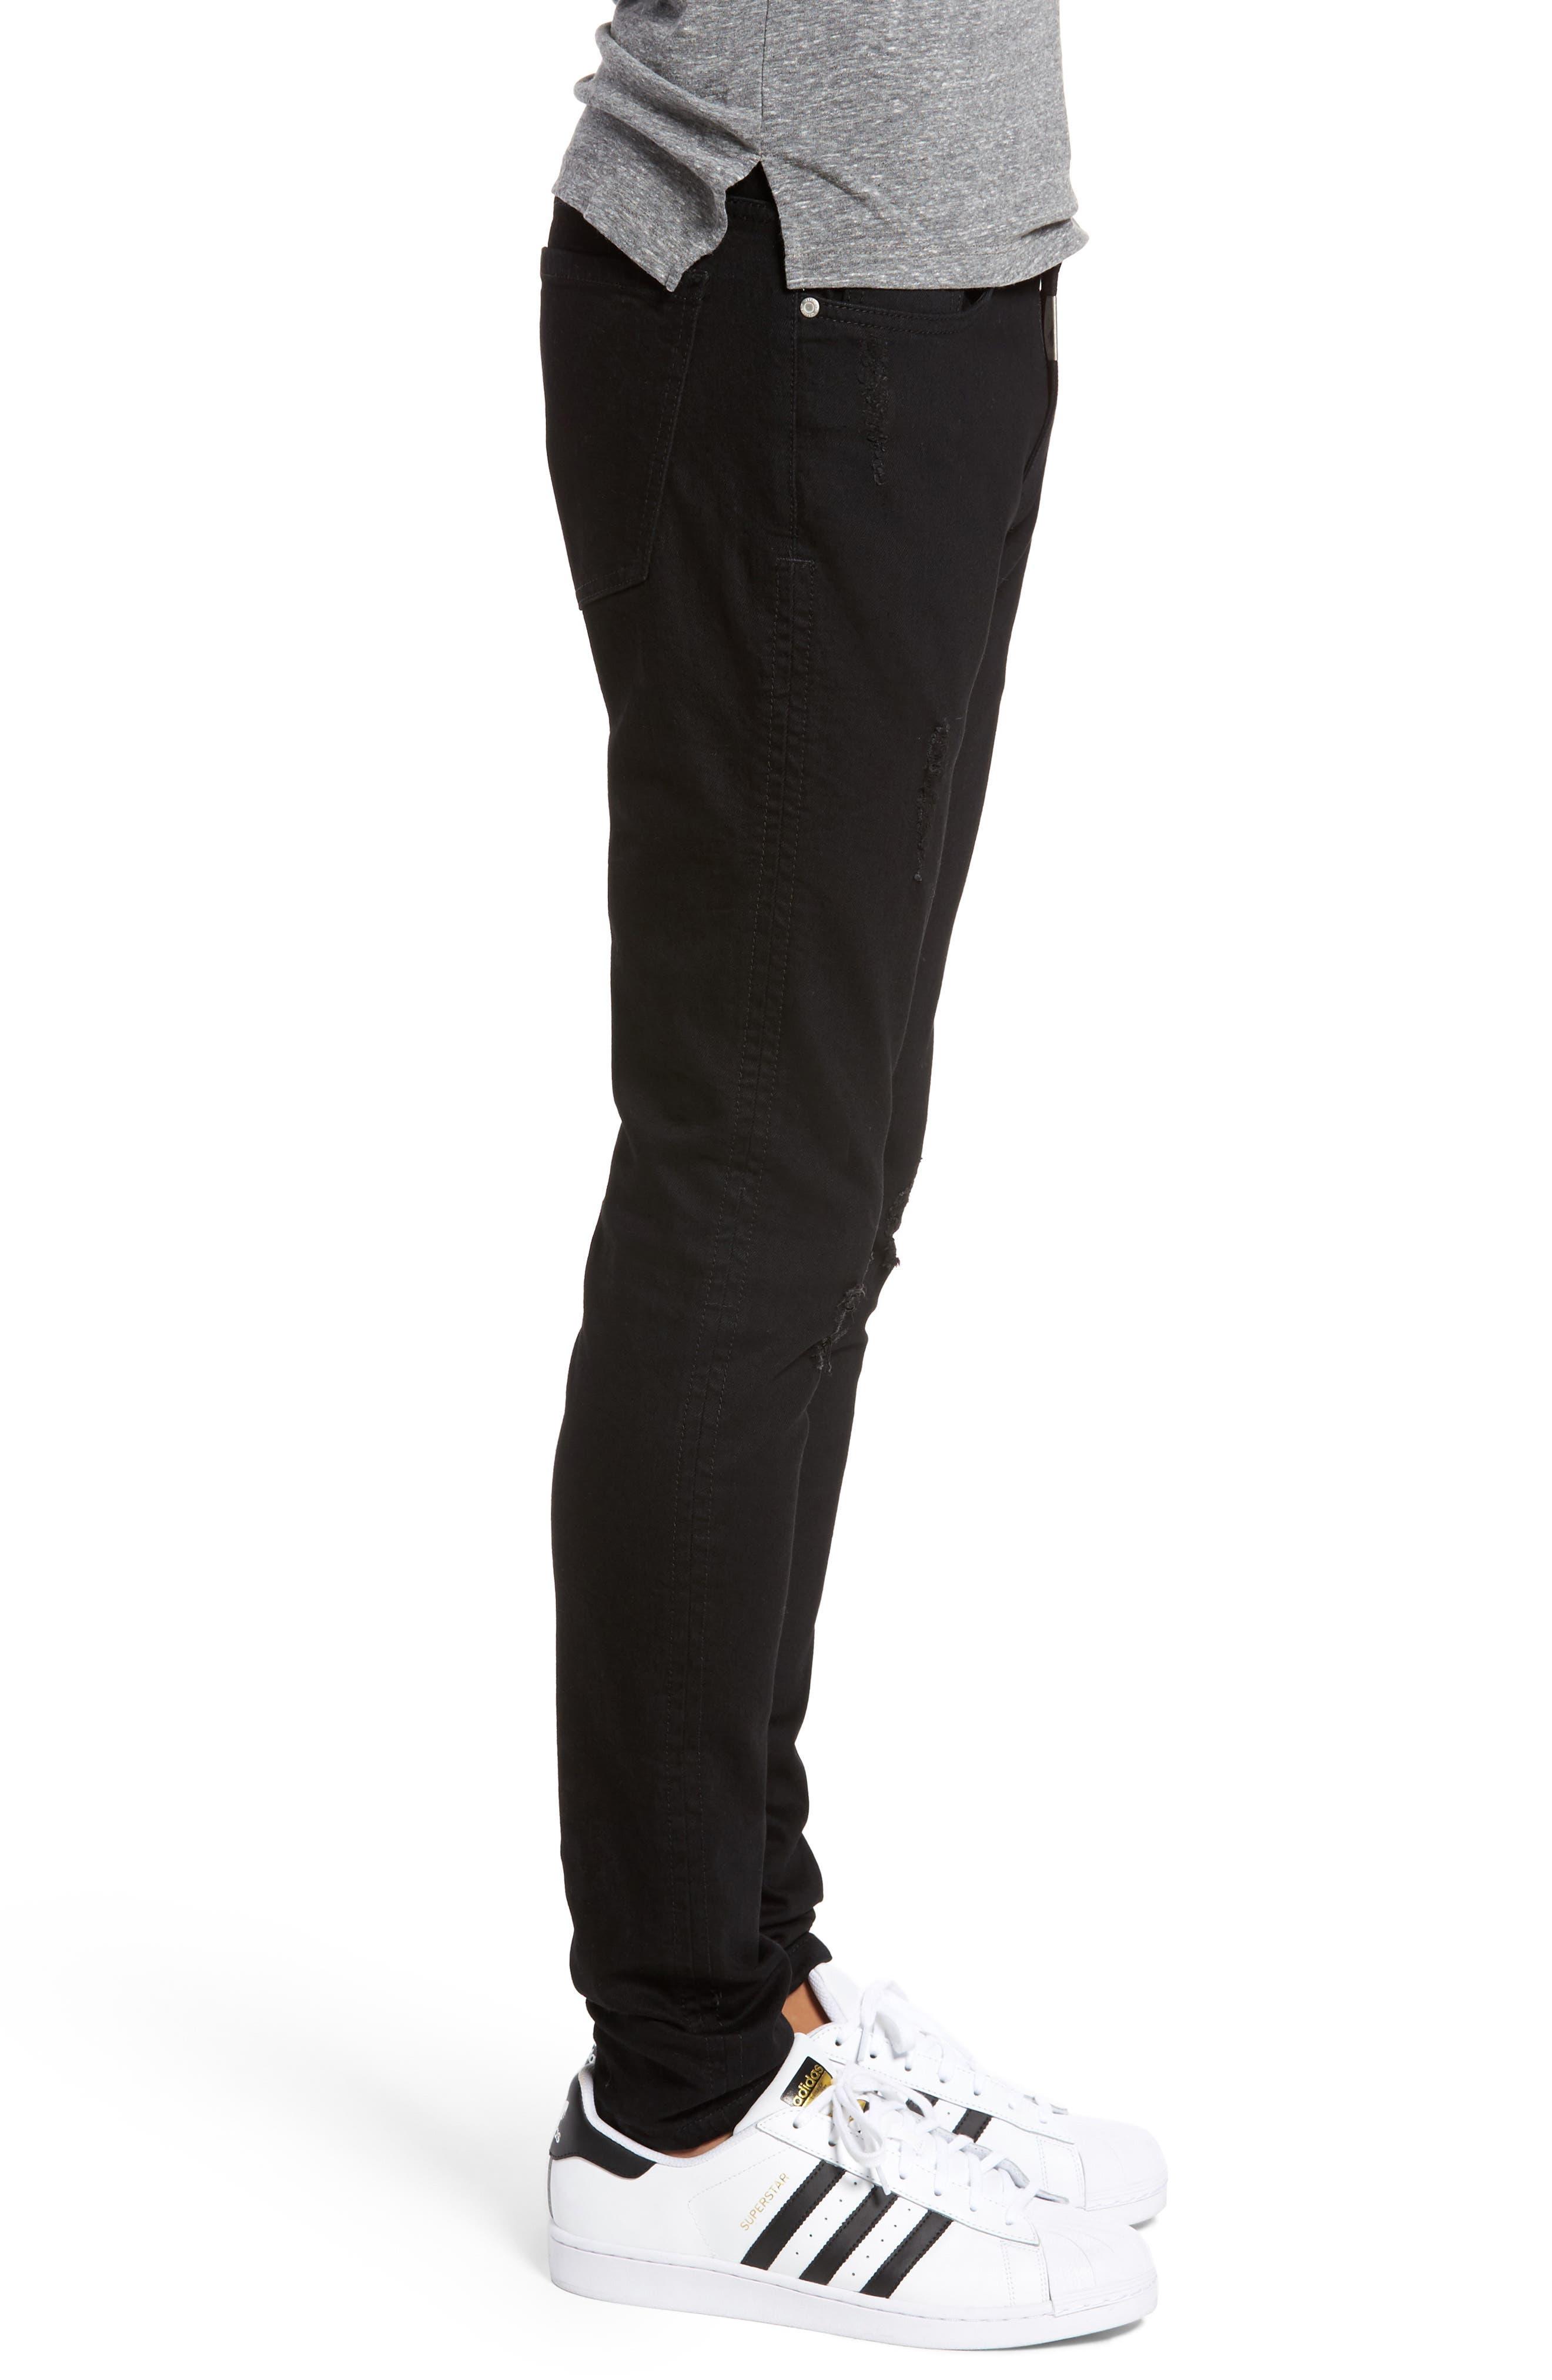 Alternate Image 3  - Represent Slim Fit Distressed Jeans